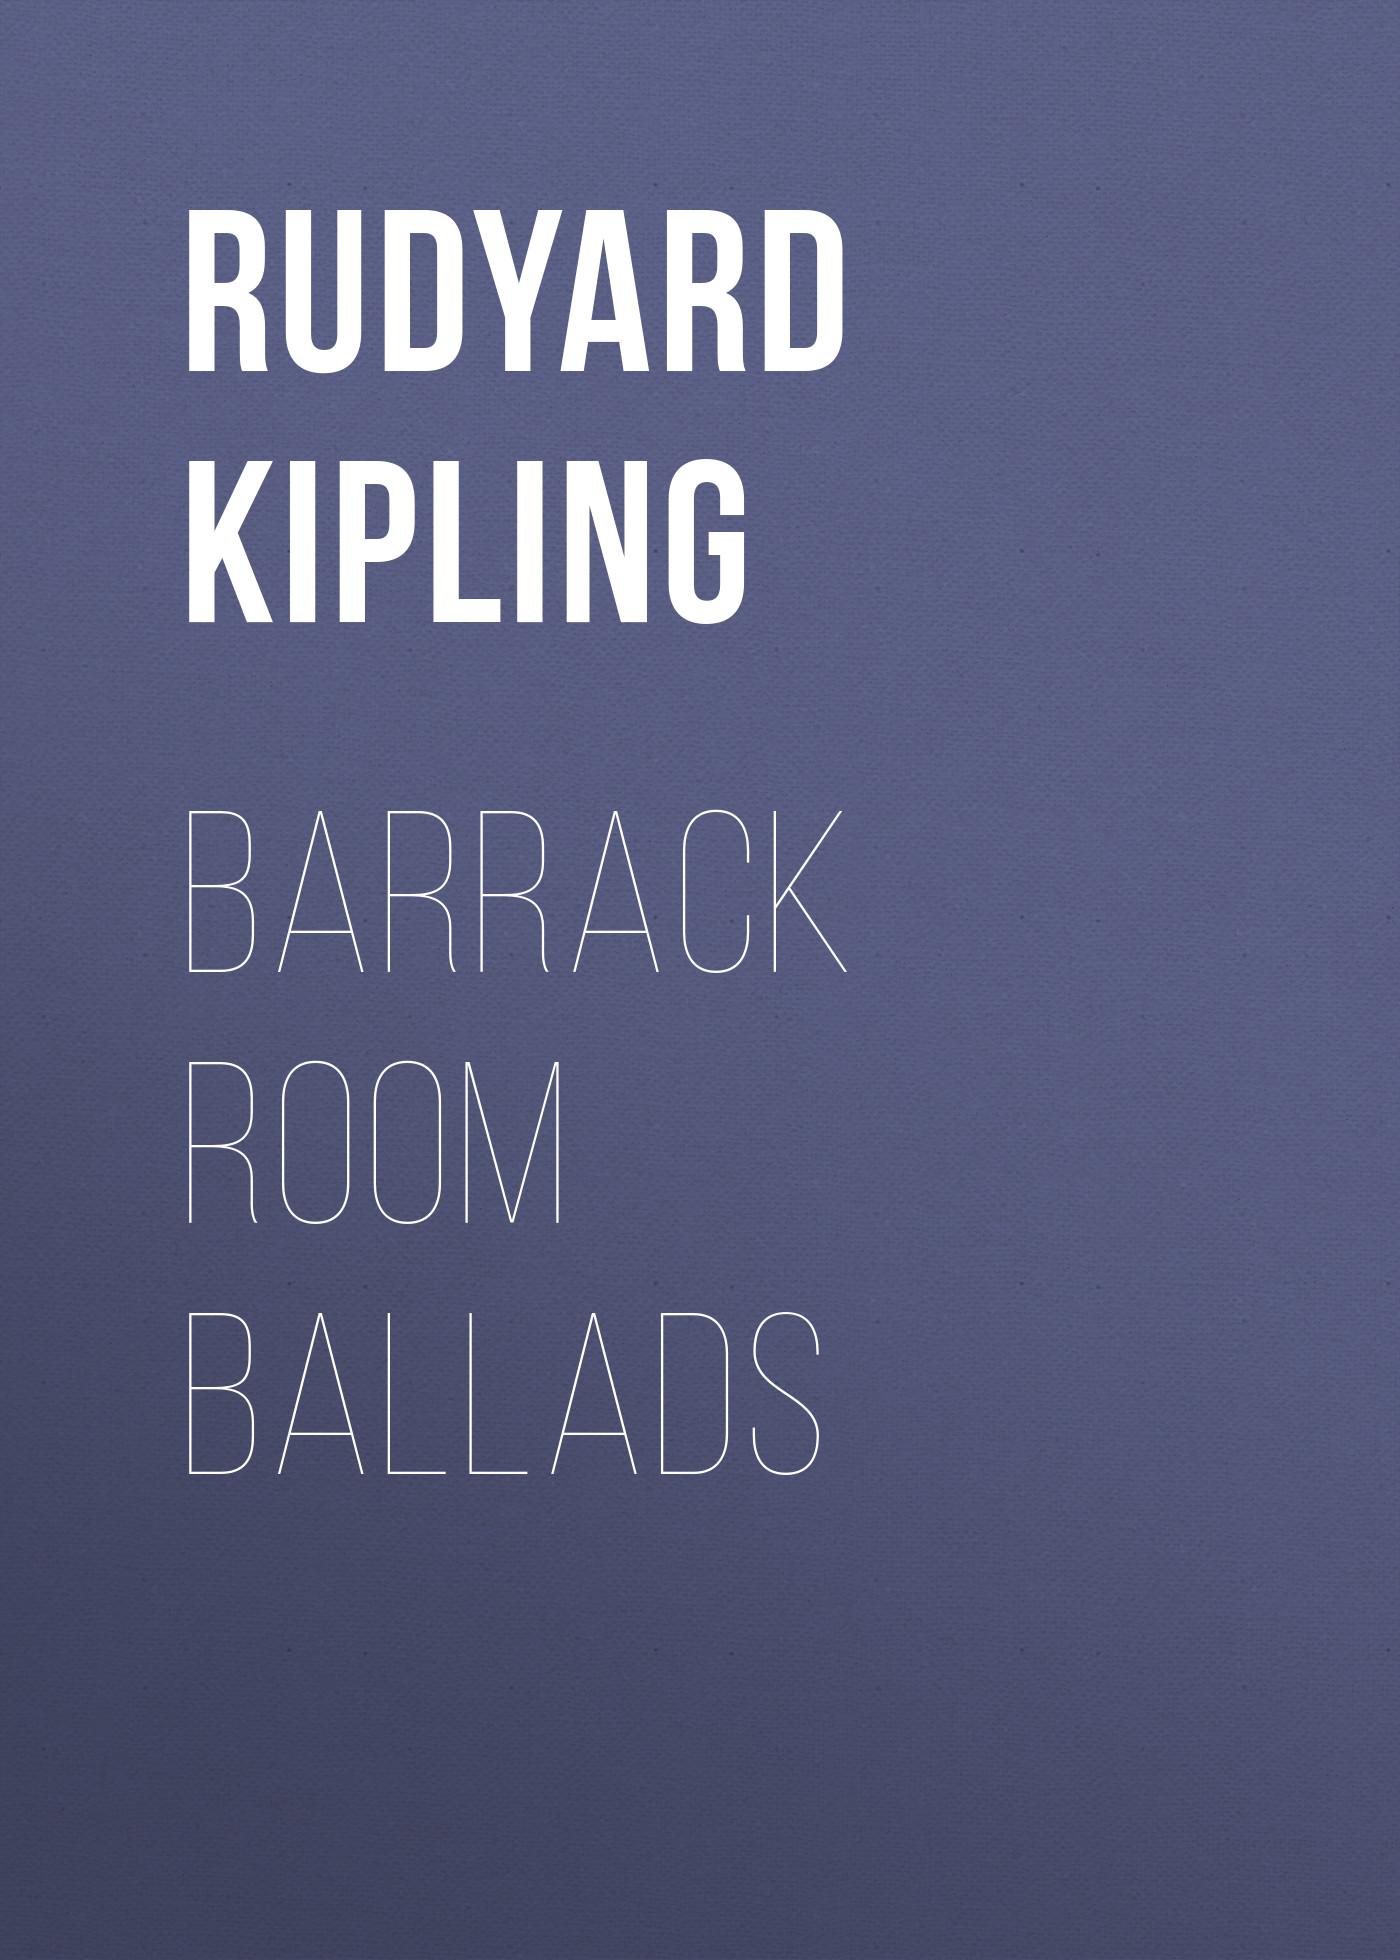 Редьярд Киплинг Barrack Room Ballads редьярд киплинг barrack room ballads